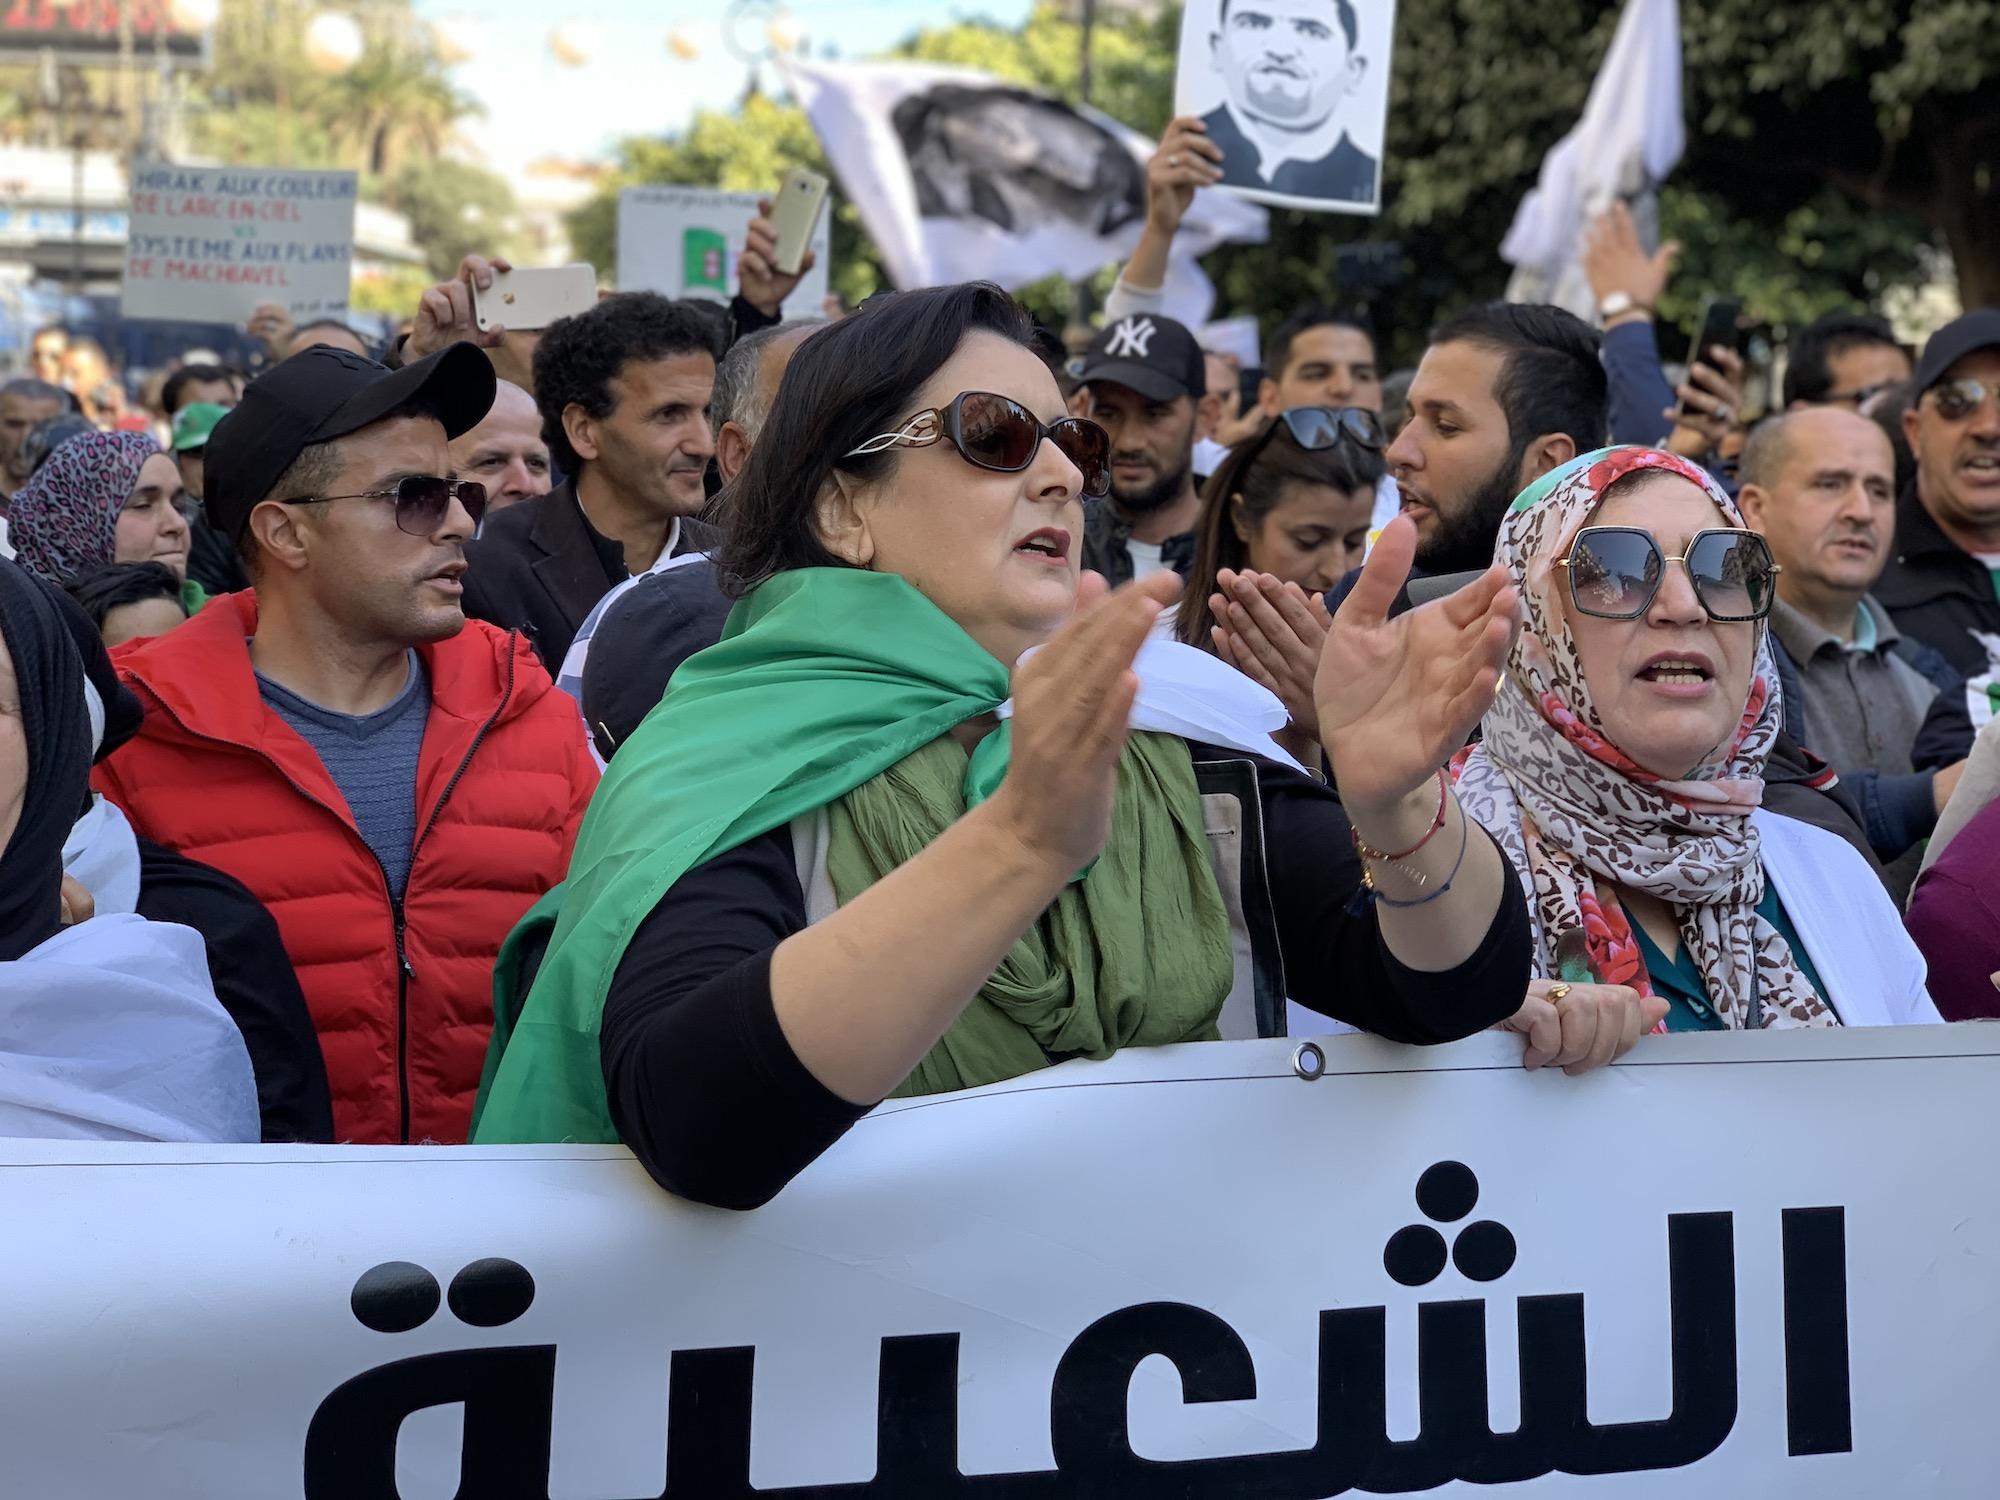 Uprisings in the time of COVID19: Algeria